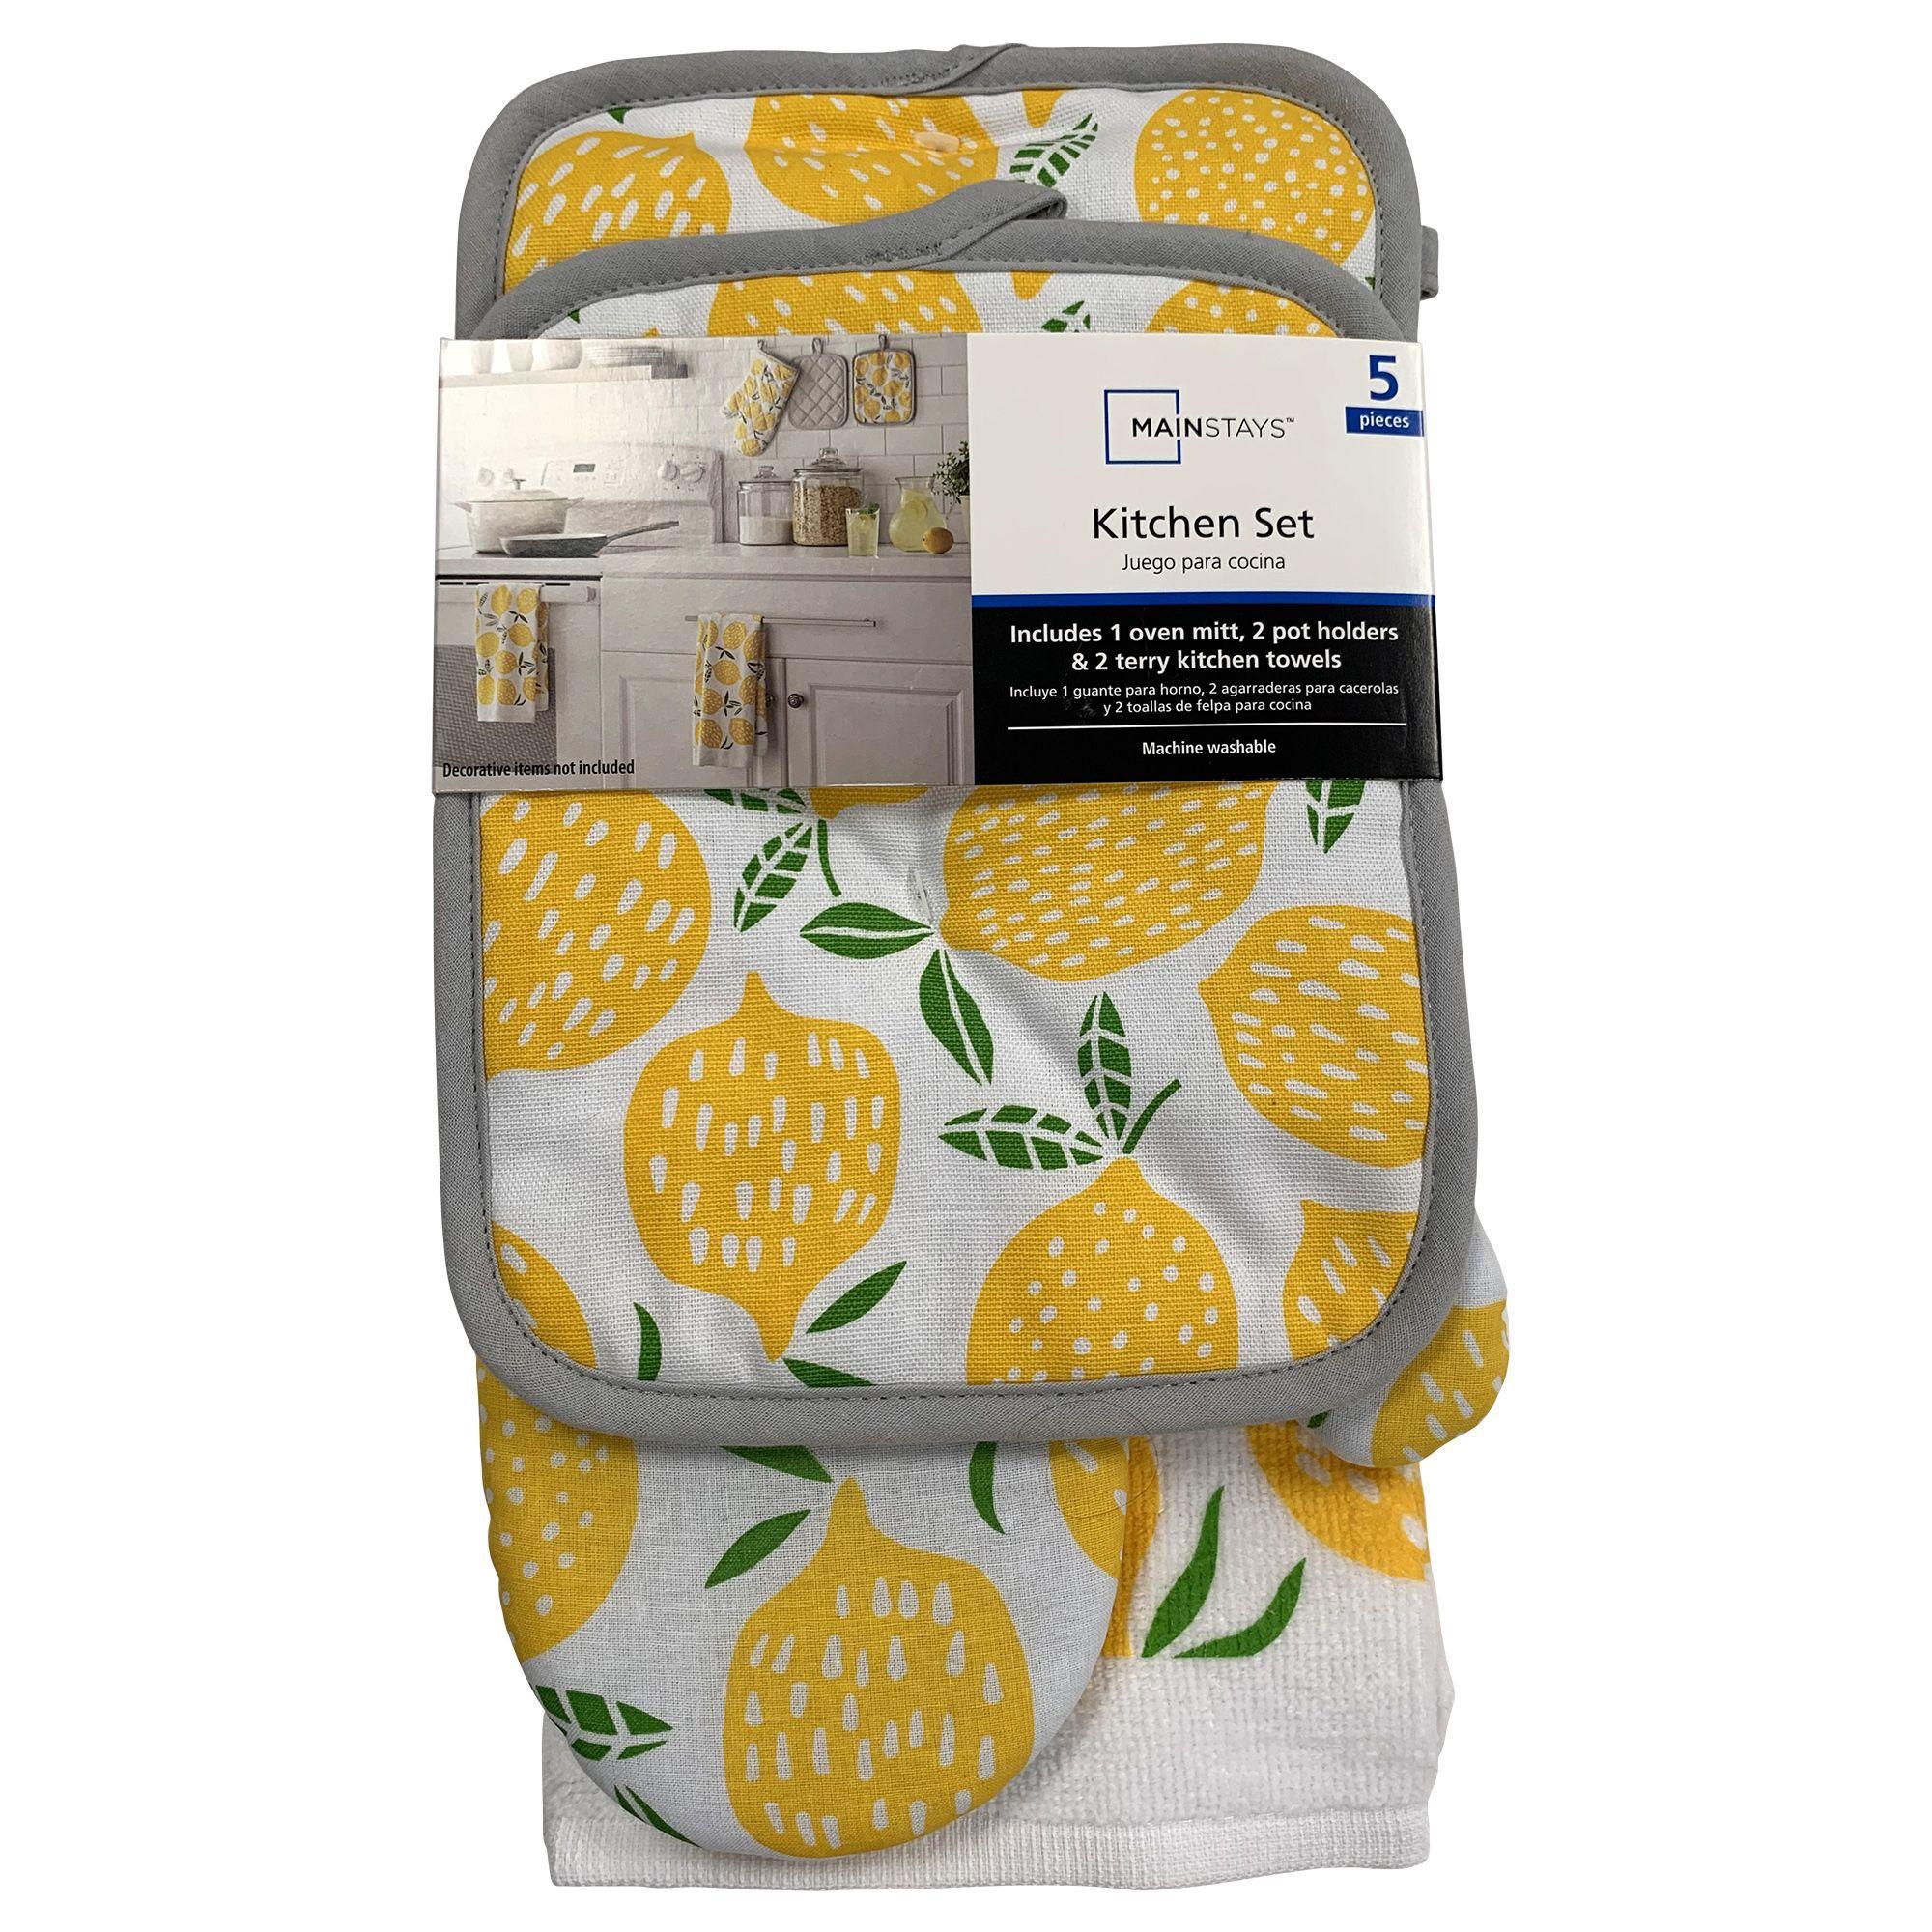 Mainstays 5 Piece Kitchen Textile Set Kitchen Towel Pot Holder Oven Mitt 100 Cotton Lemon Toss Walmart Com Walmart Oven Mitts Kitchen Towels Mainstays